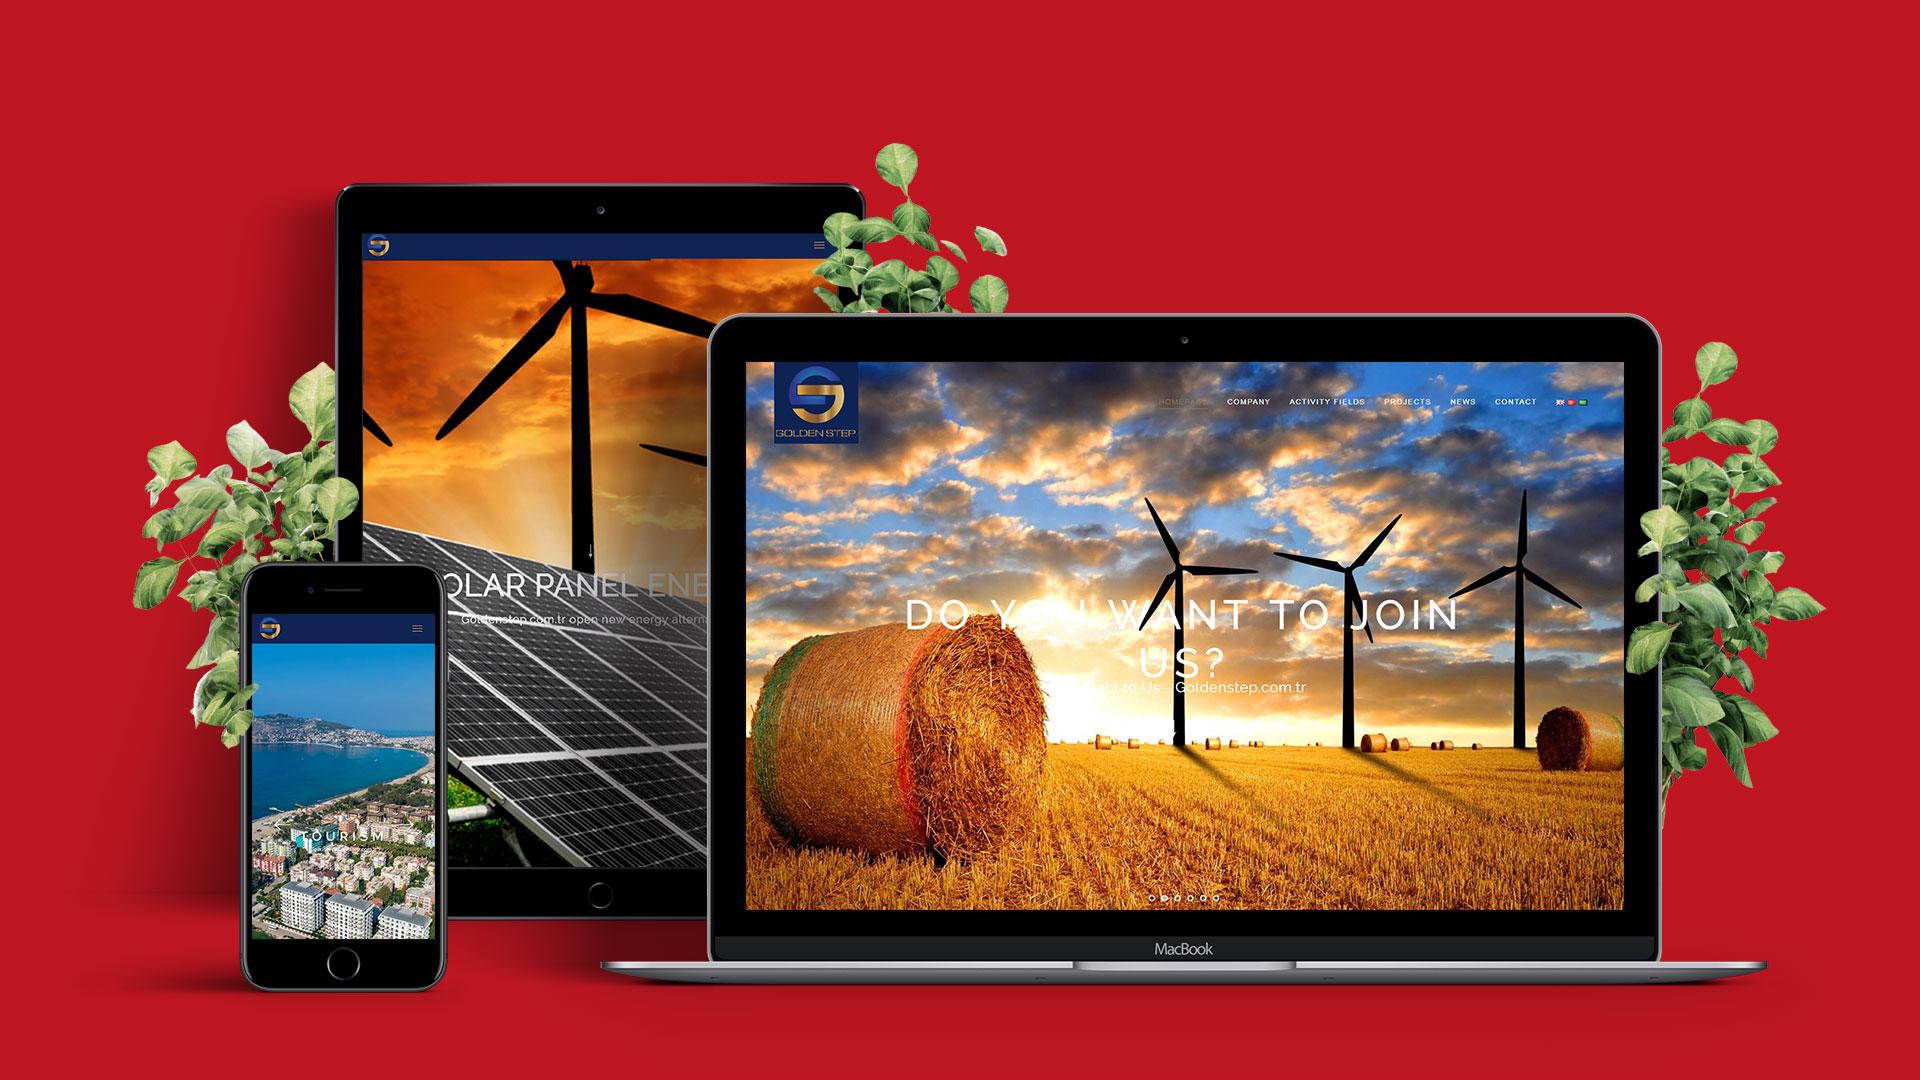 webfili-goldenstep-enerji-tarım-Turizm-Alanya-01 .jpg